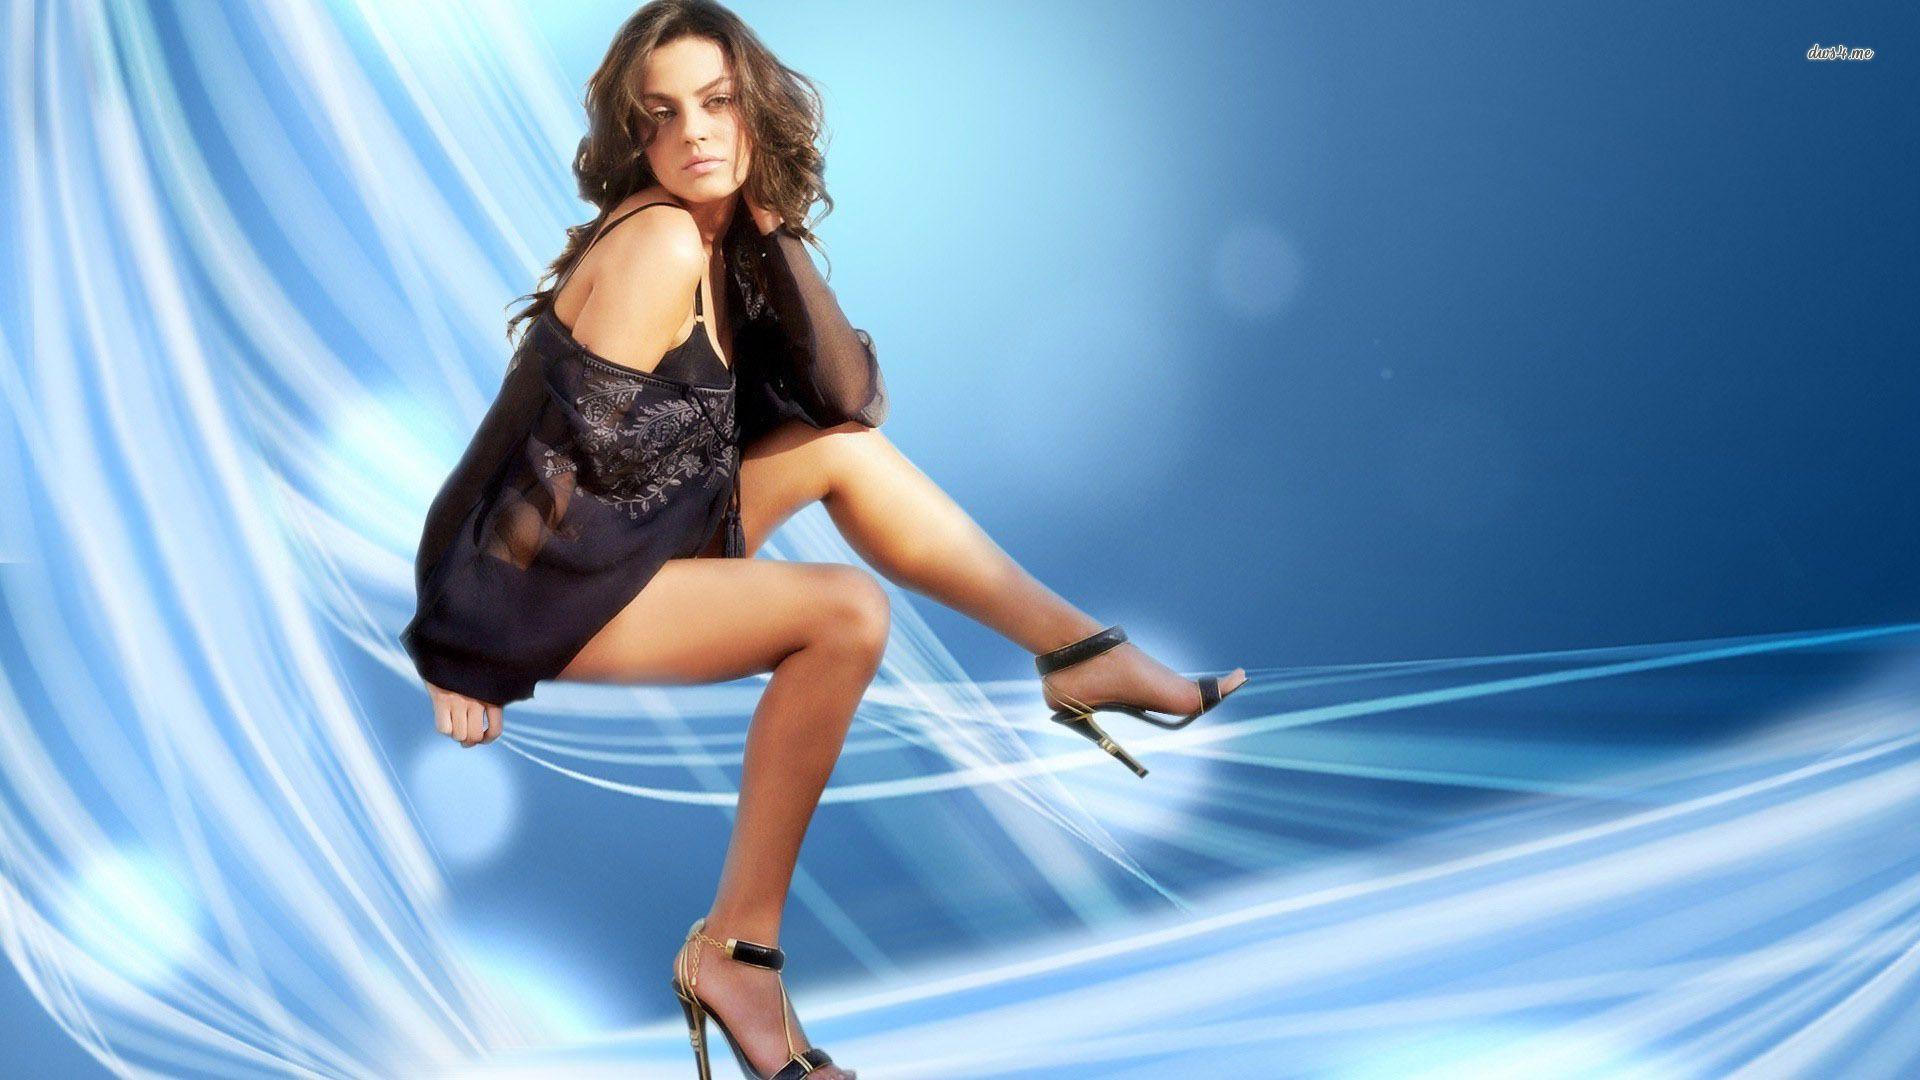 Mila Kunis Wallpaper 60 Backgrounds | Wallruru.